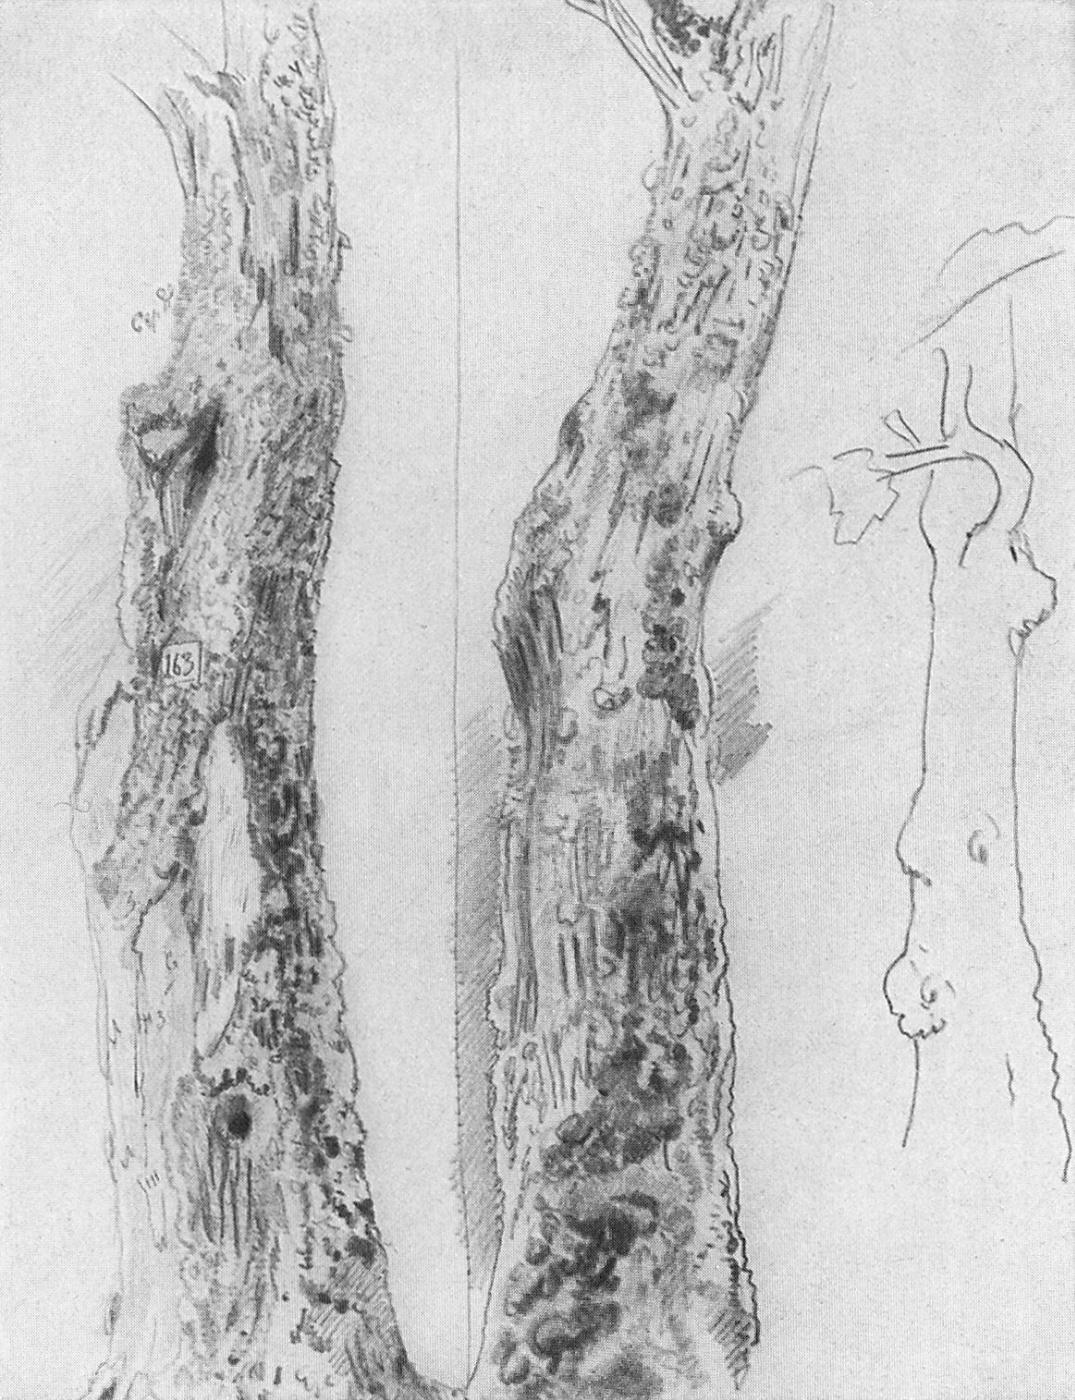 Ivan Shishkin. Sketch trunks